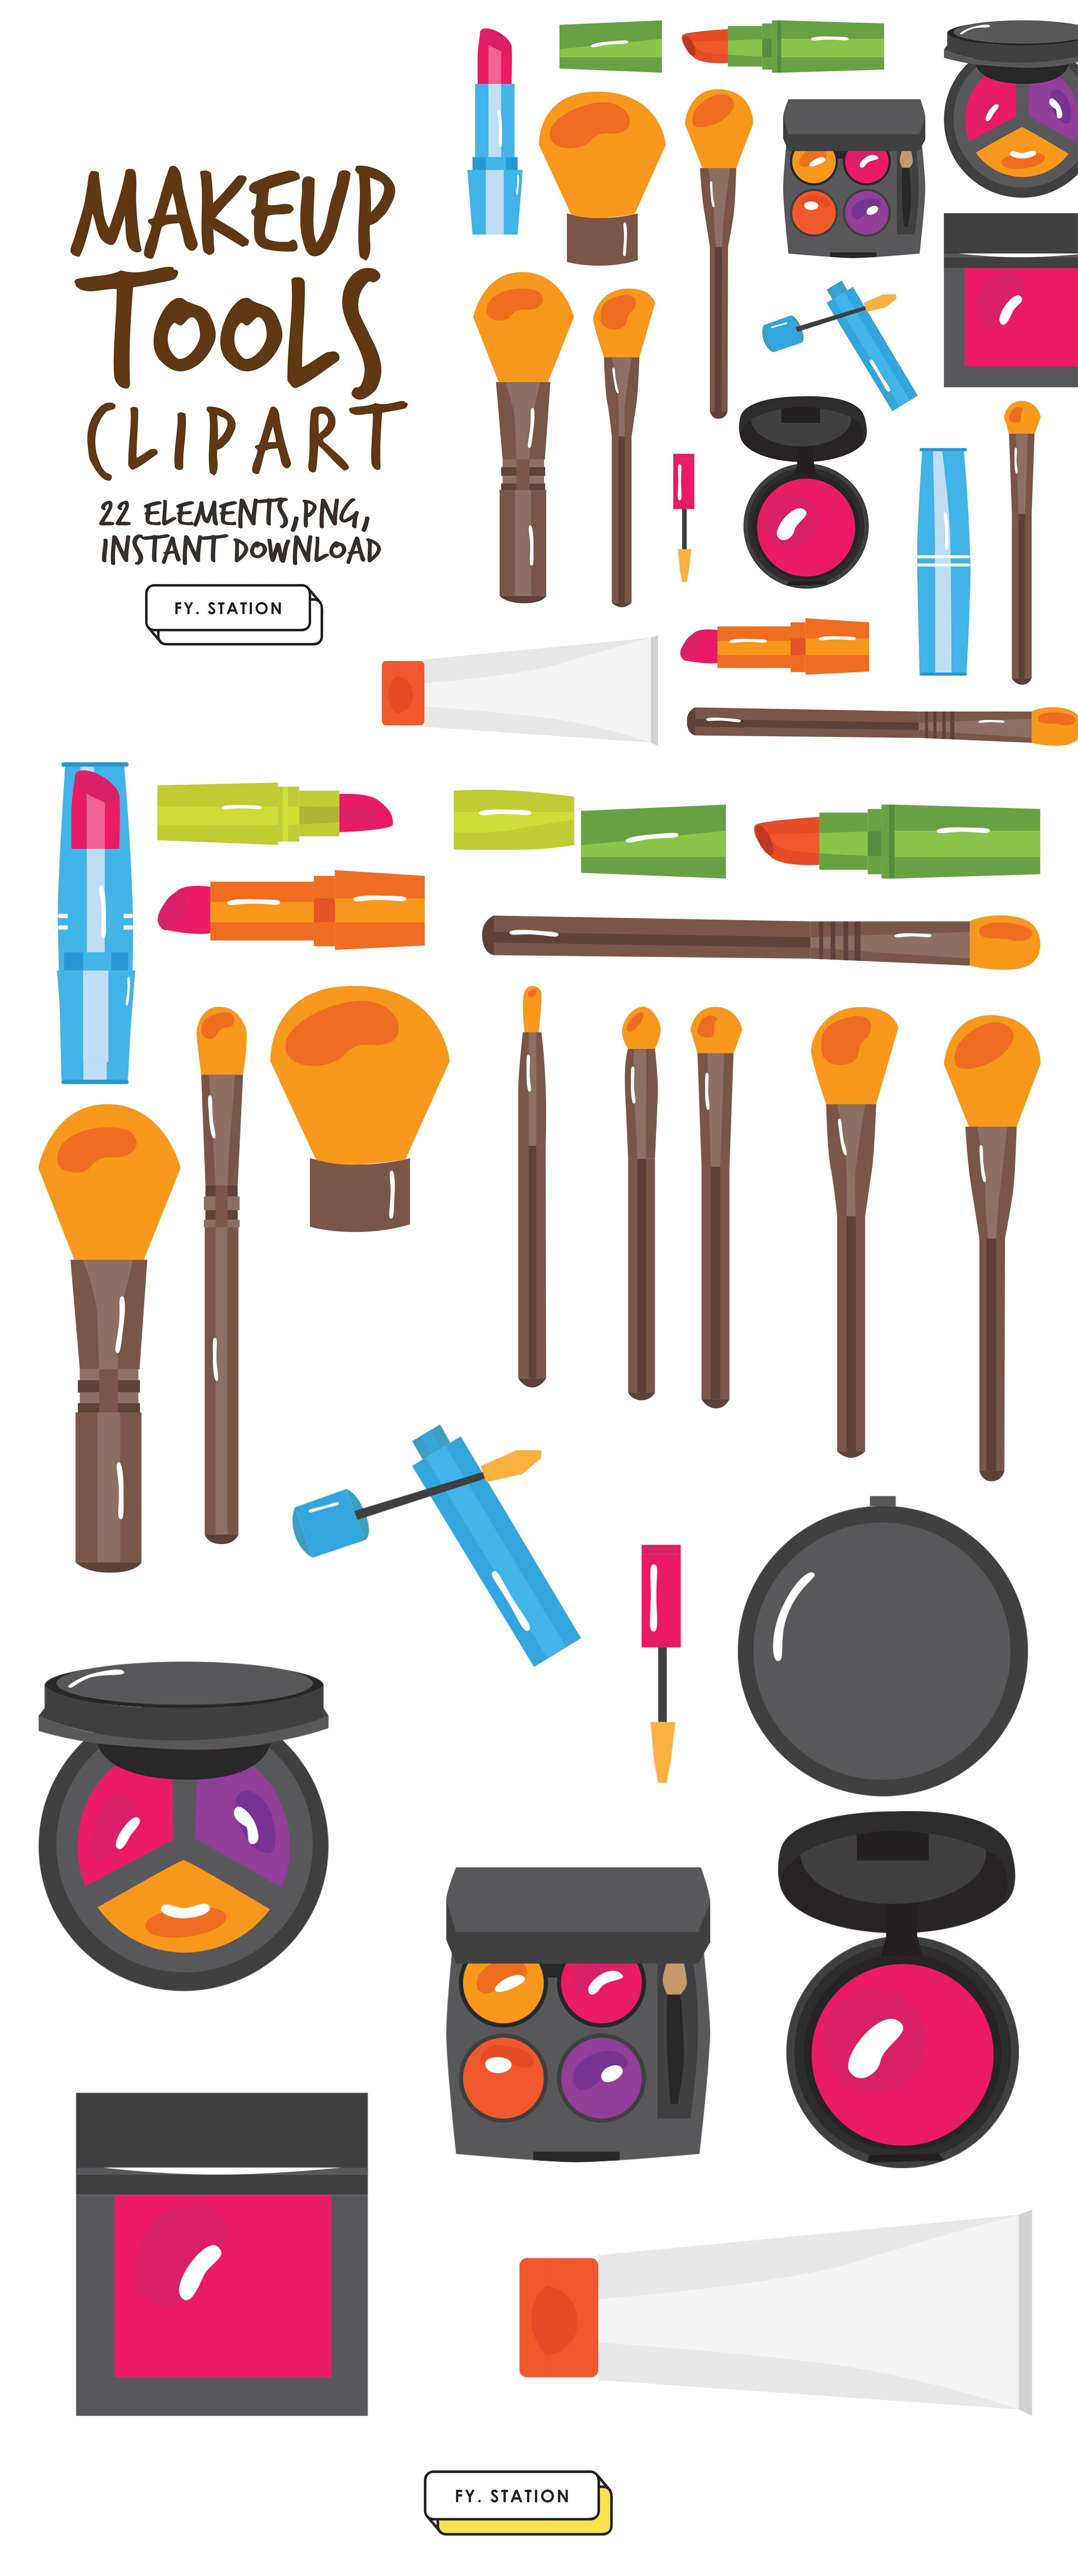 Makeup Tools Clipart Pack 1 Diy Elements Illustration Printable Instant Download Diy Clip Art